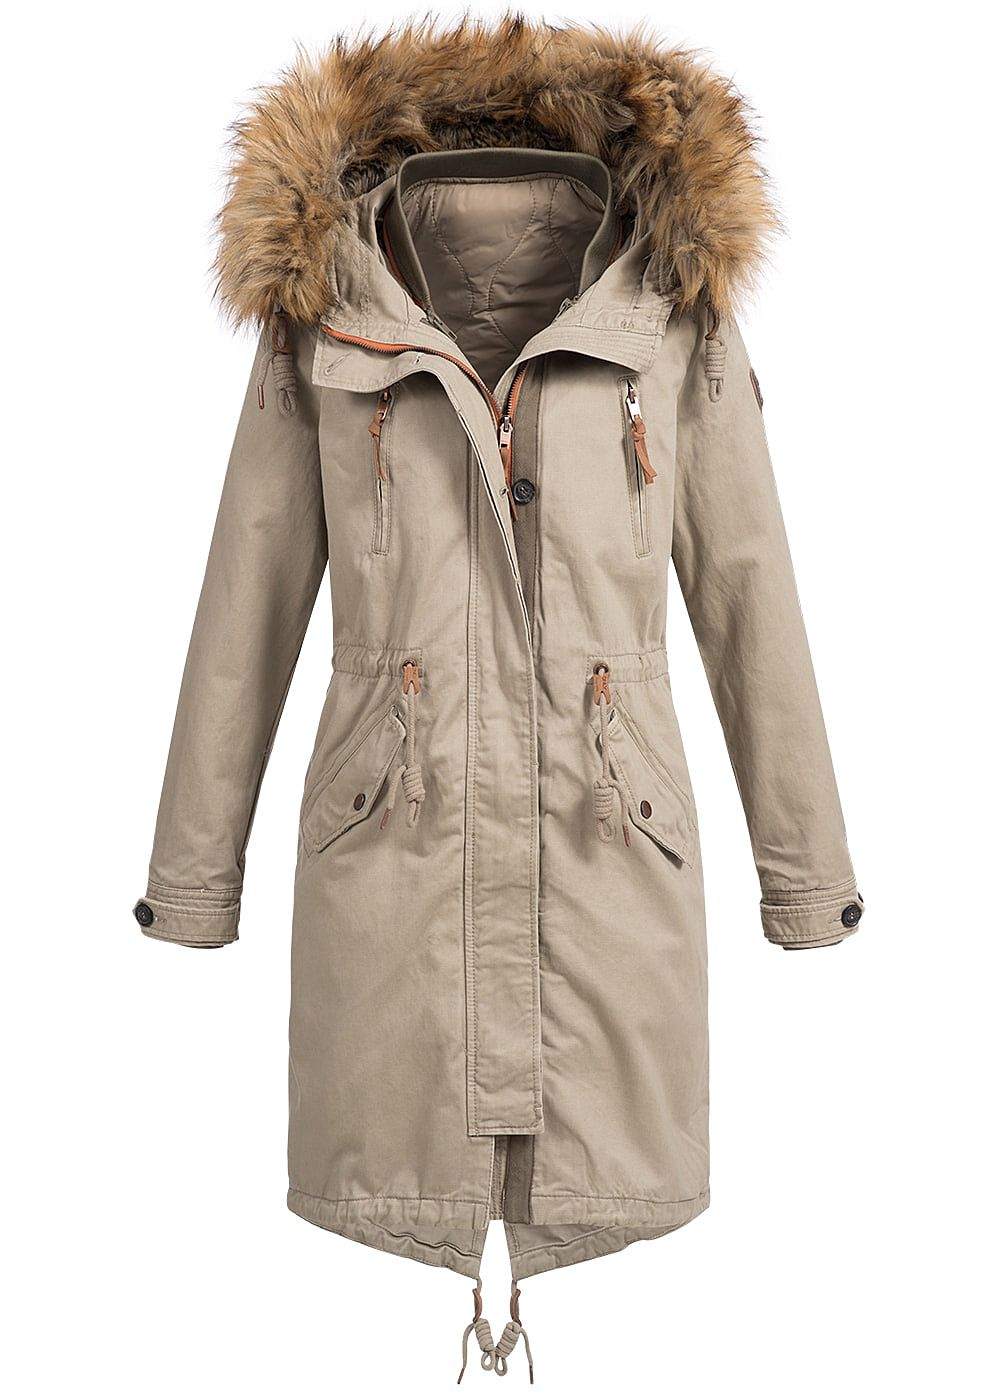 only damen winter mantel kapuze abnehmb kunstfell tunnelzug silver mink beige 77onlineshop. Black Bedroom Furniture Sets. Home Design Ideas